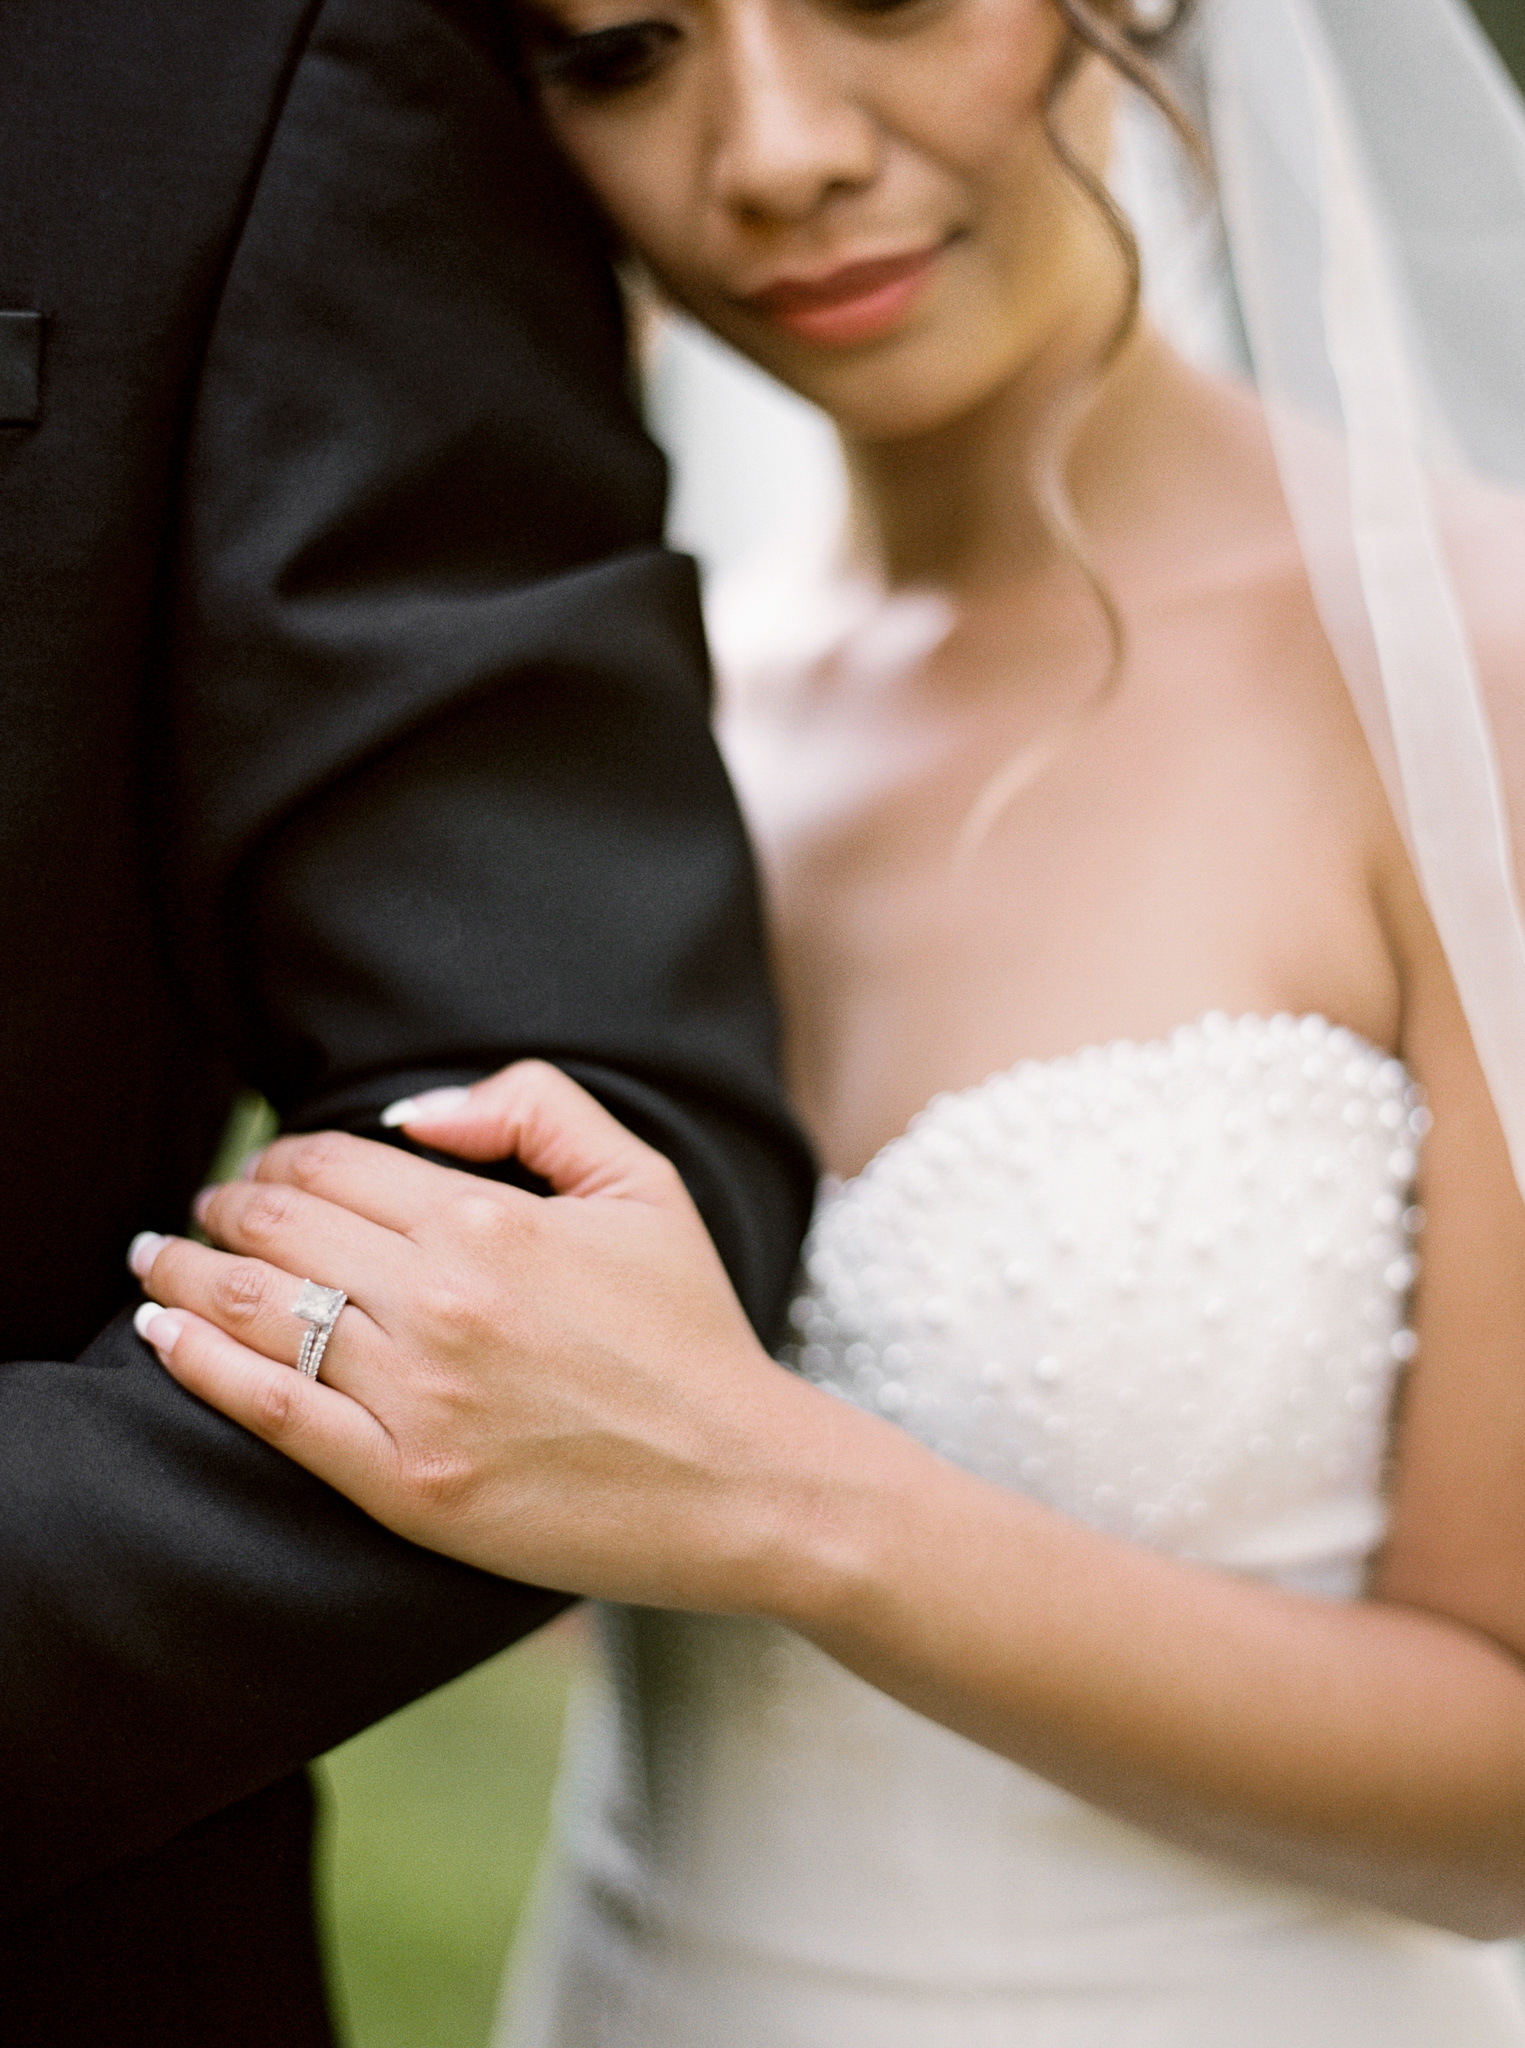 111OutliveCreative_Travel_Photographer_Videographer_Lewis&Clark_Oregon_Elegant_BlackTie_Destination_Wedding.jpg